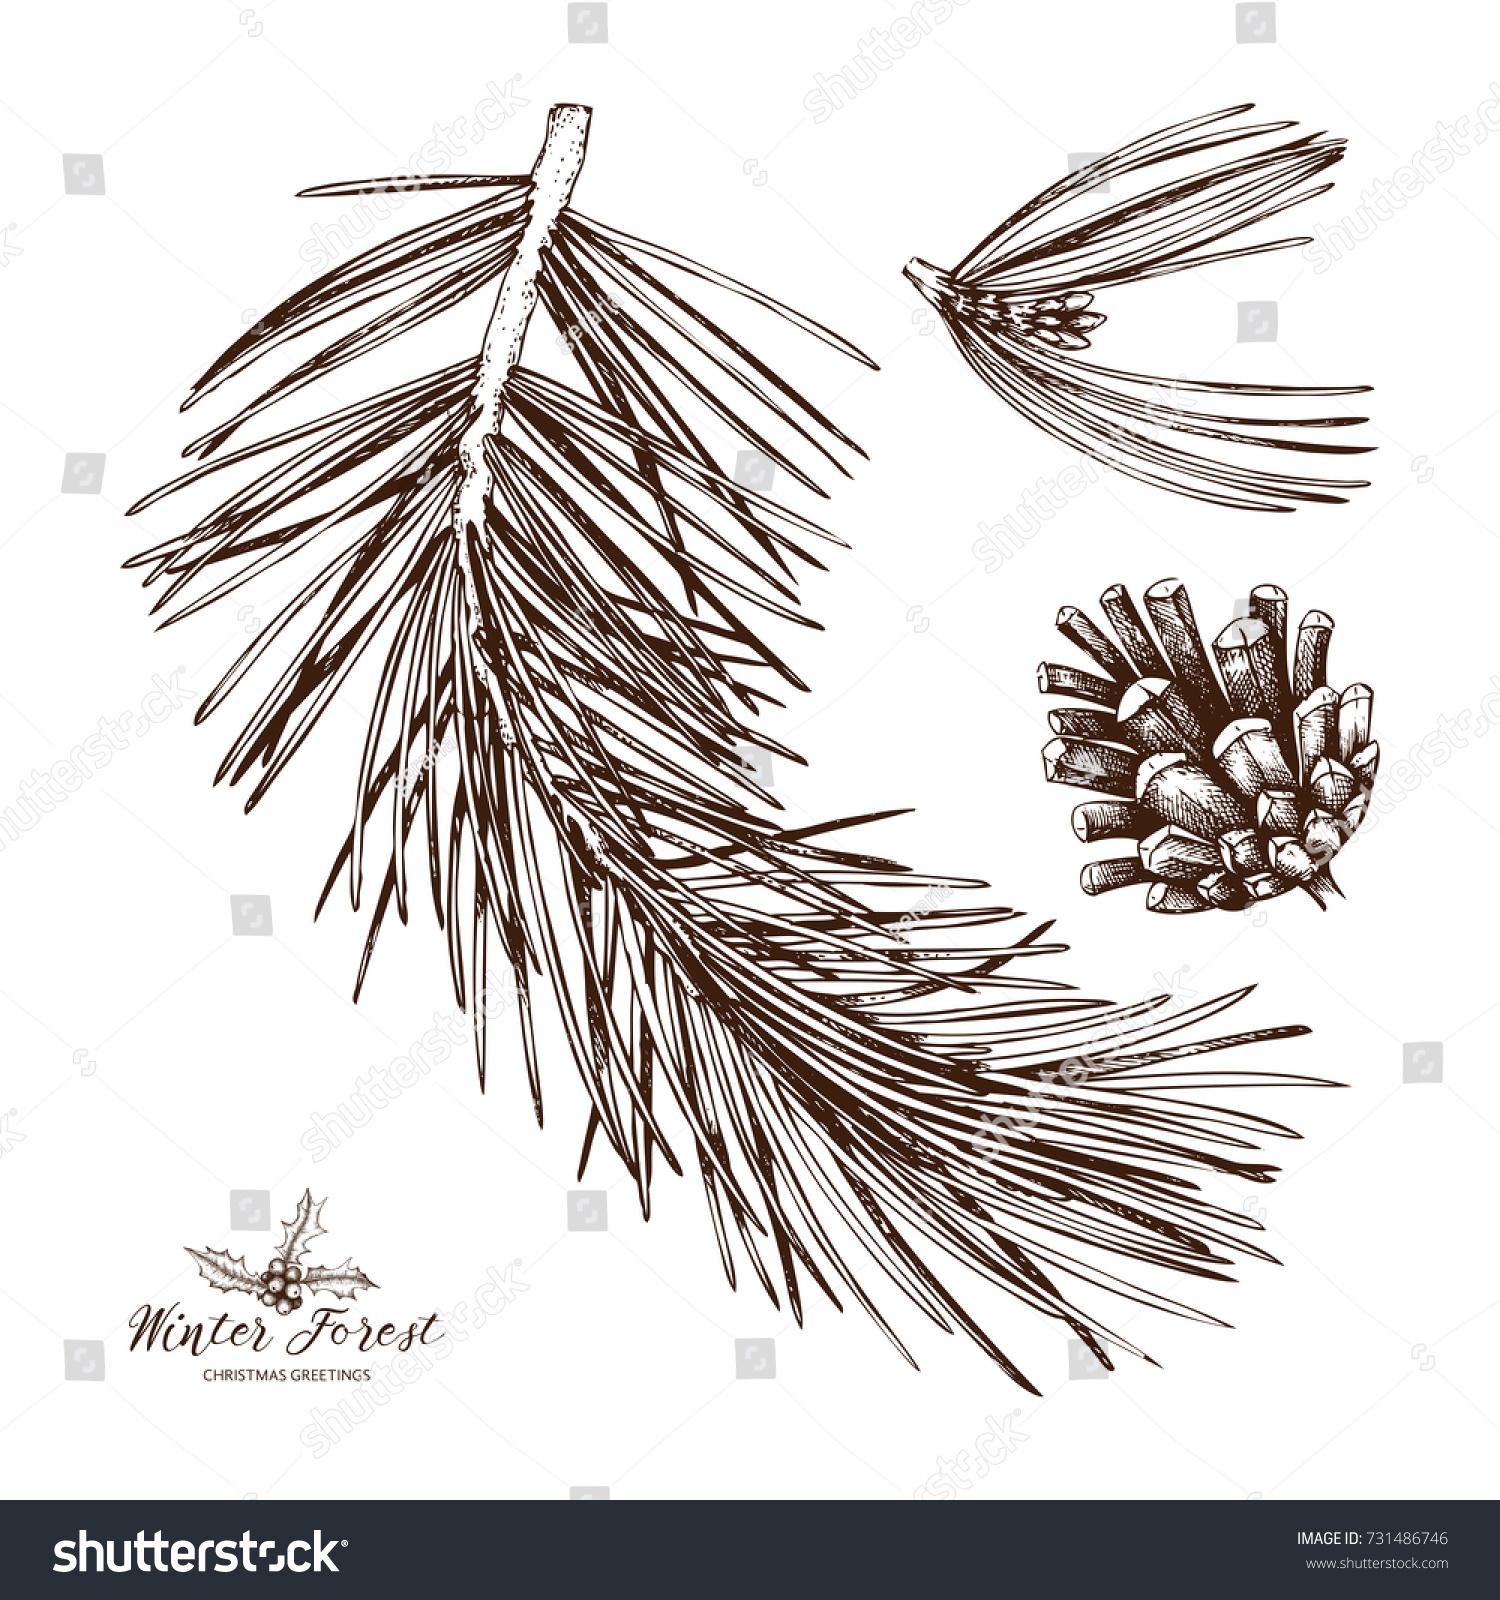 Vintage Pine Tree Illustration Hand Drawn Stock Vector 731486746